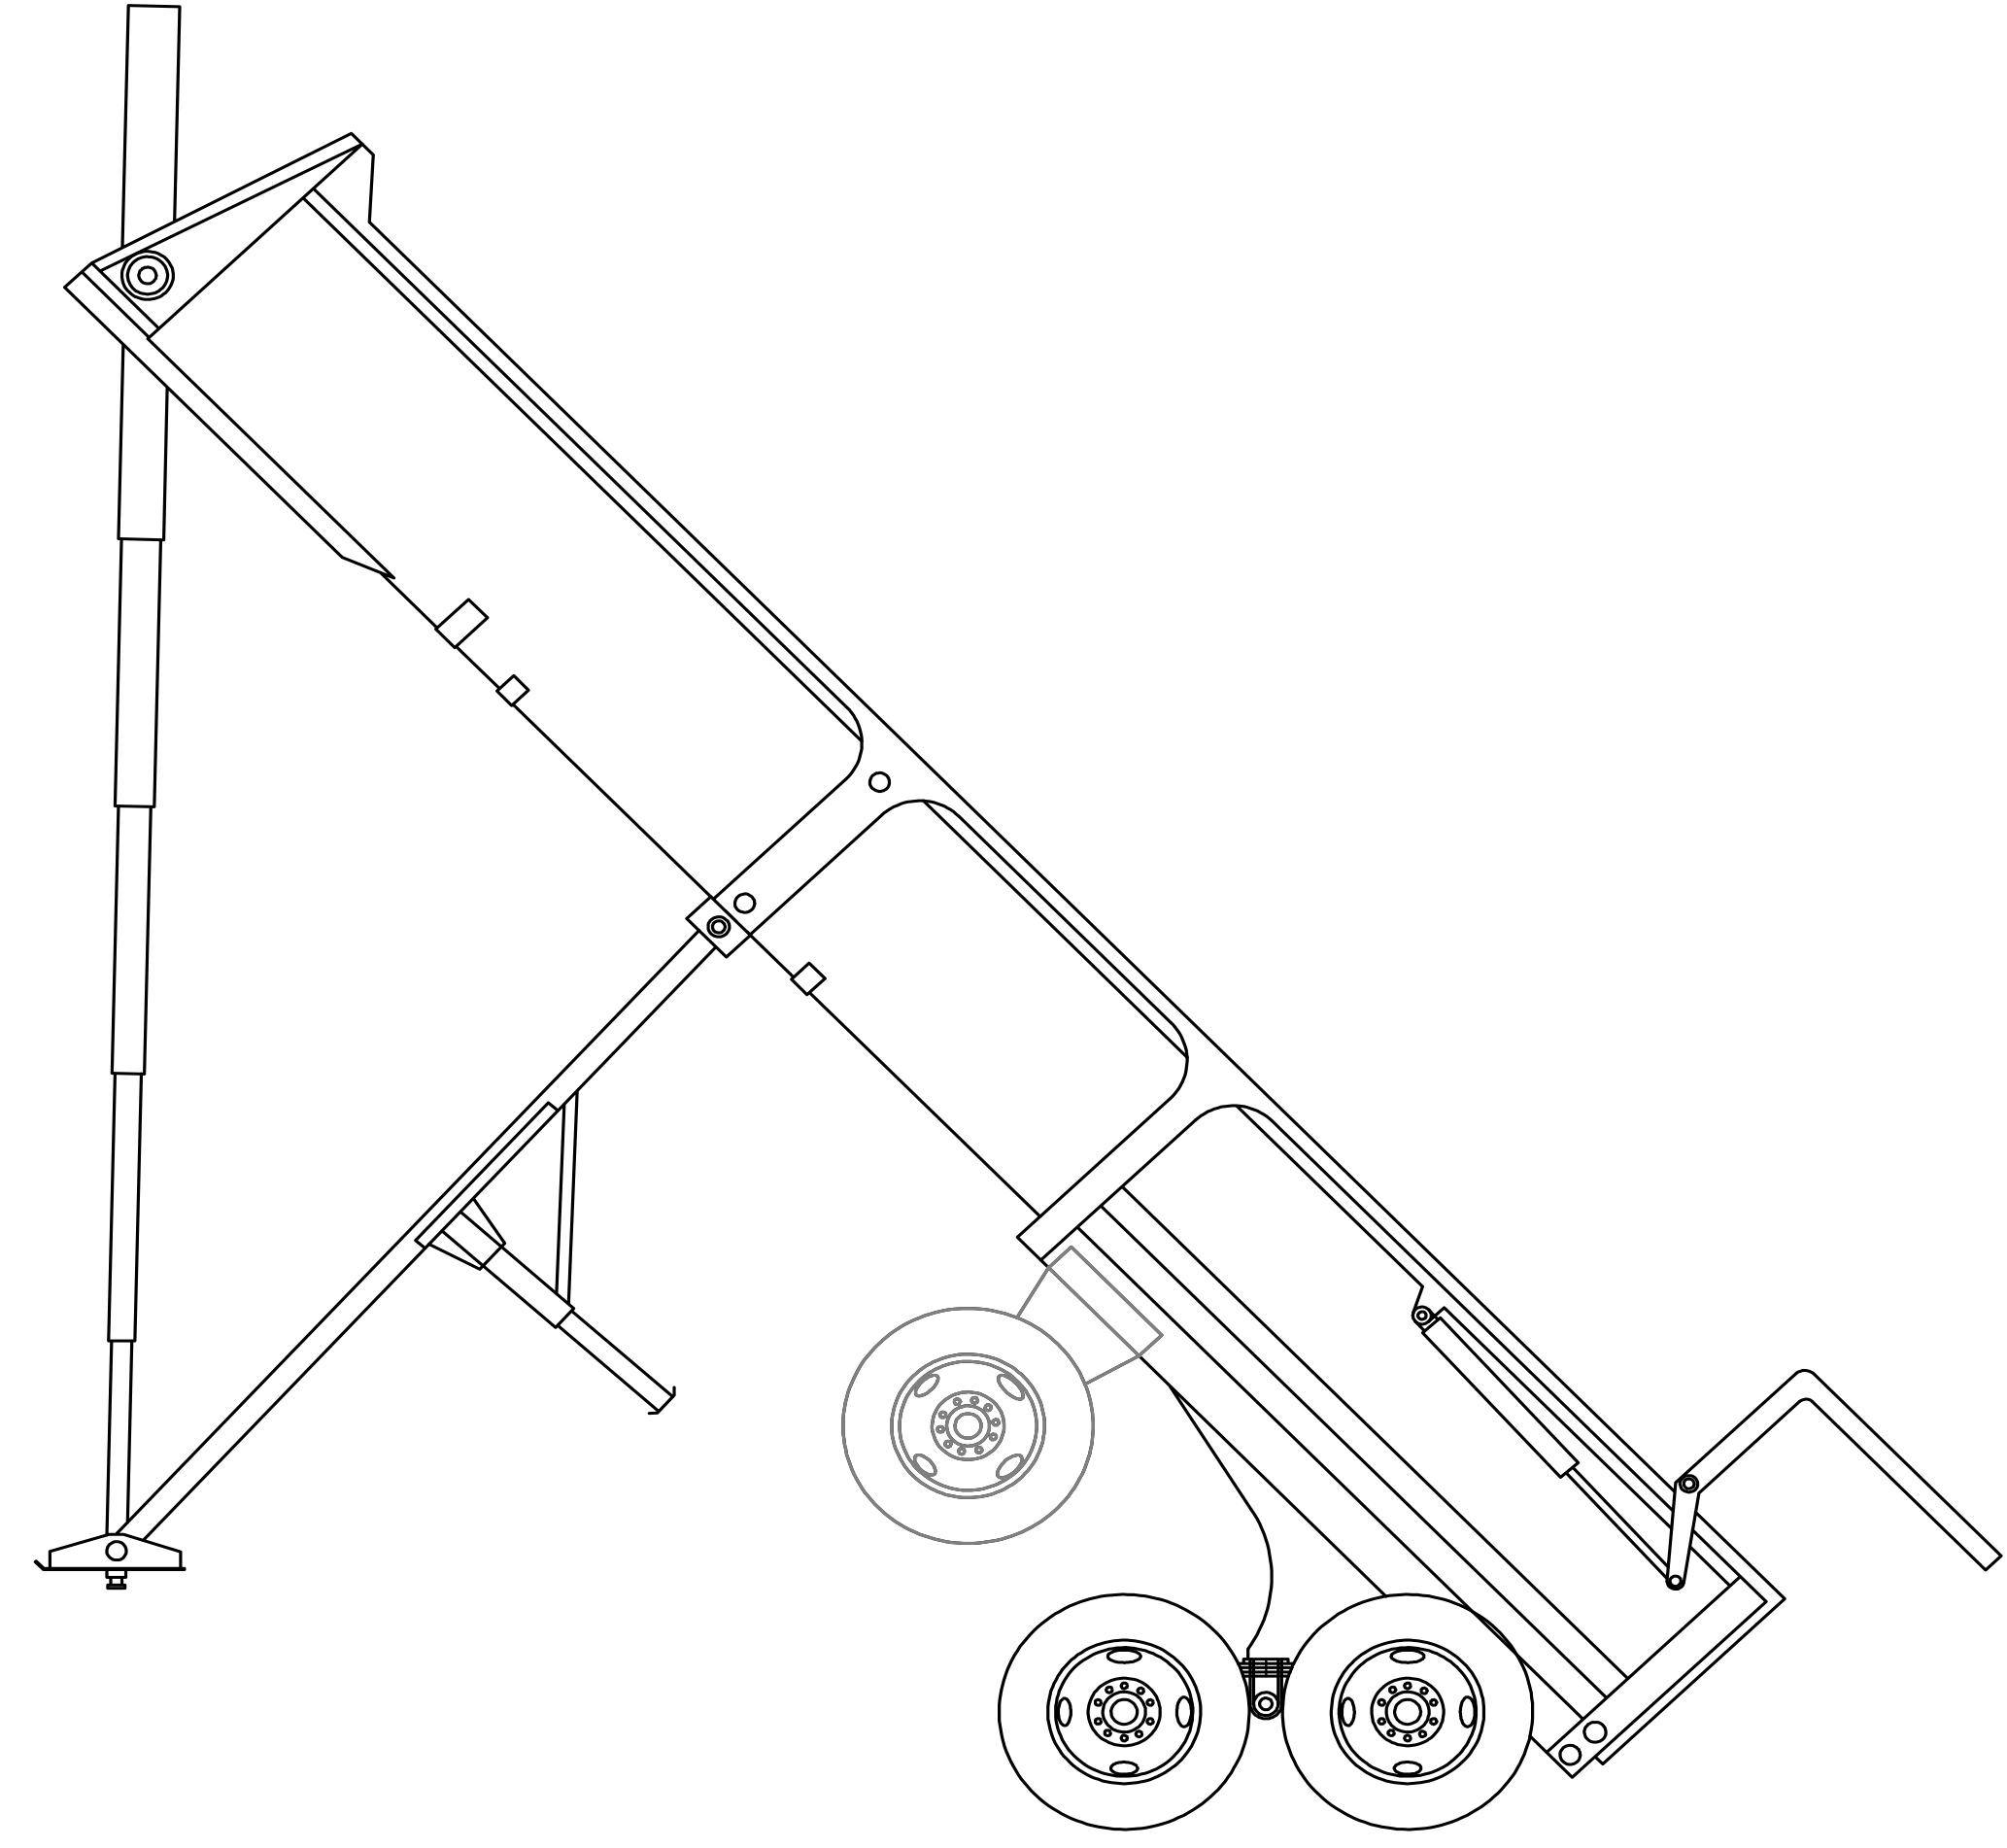 ED24-30-3 Ranco End Dump Trailer Drawing